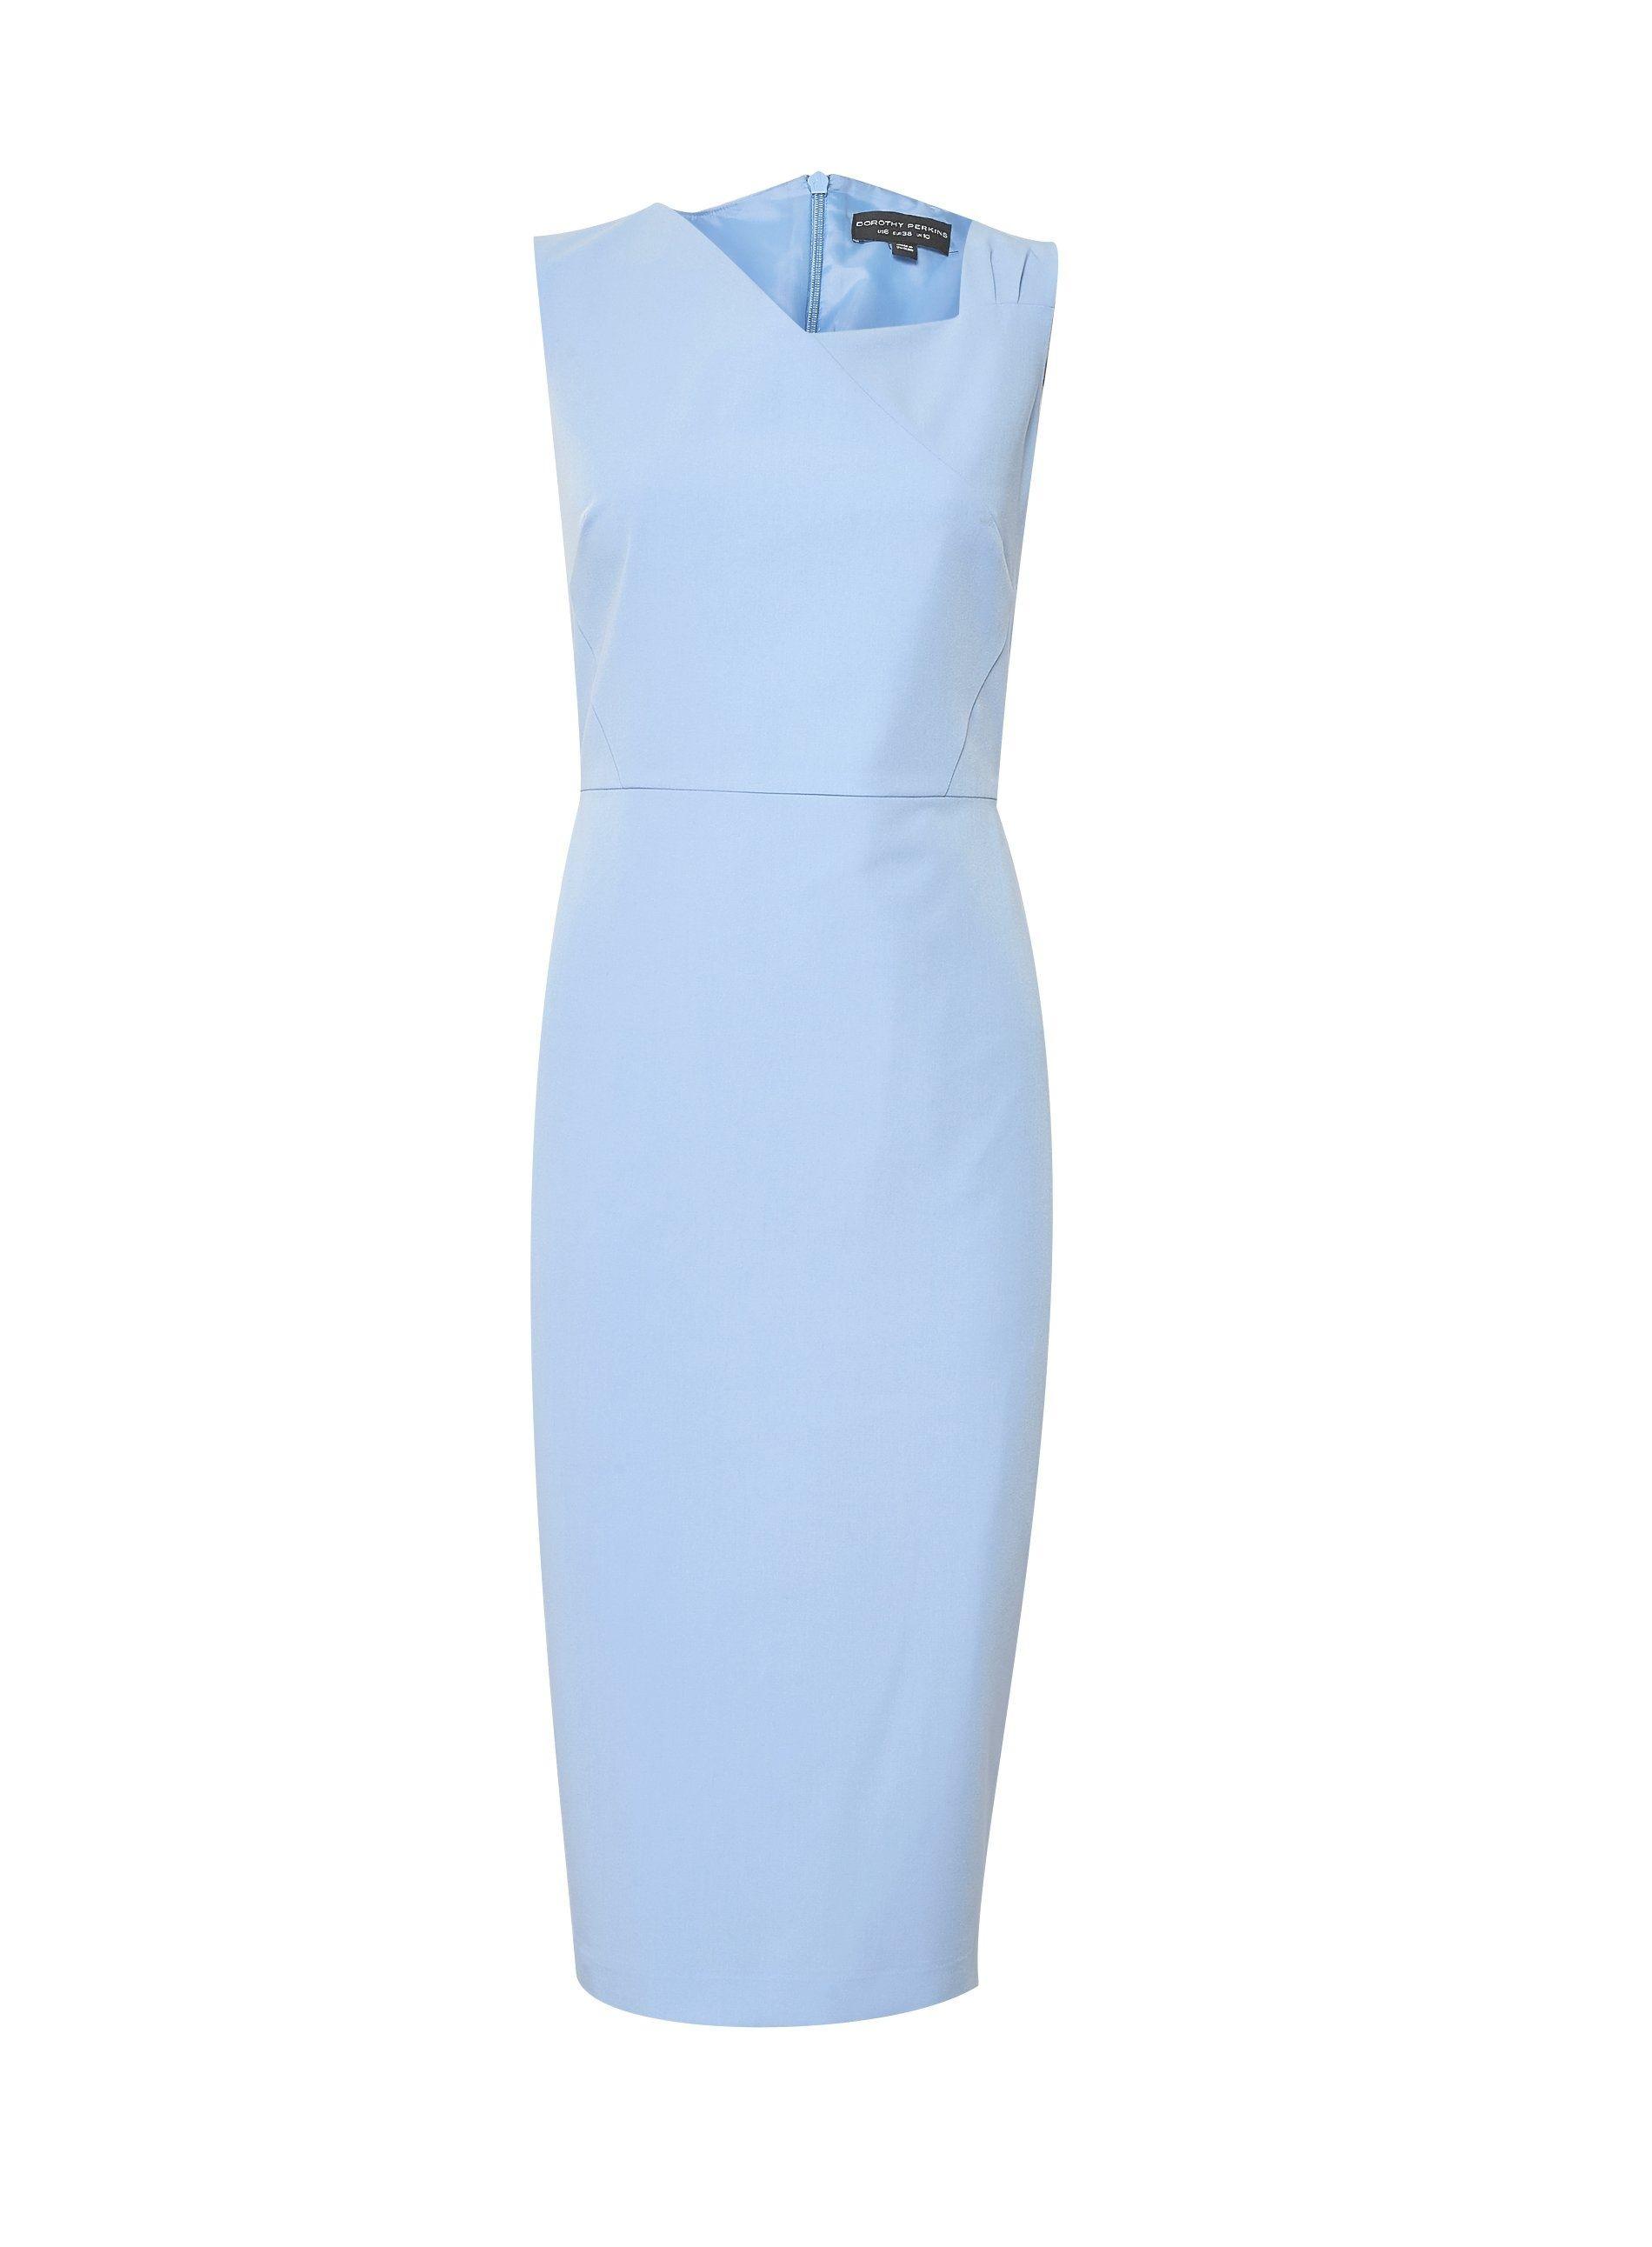 Dorothy Perkins Womens Blue Asymmetric Neck Midi Pencil Dress Sleeveless